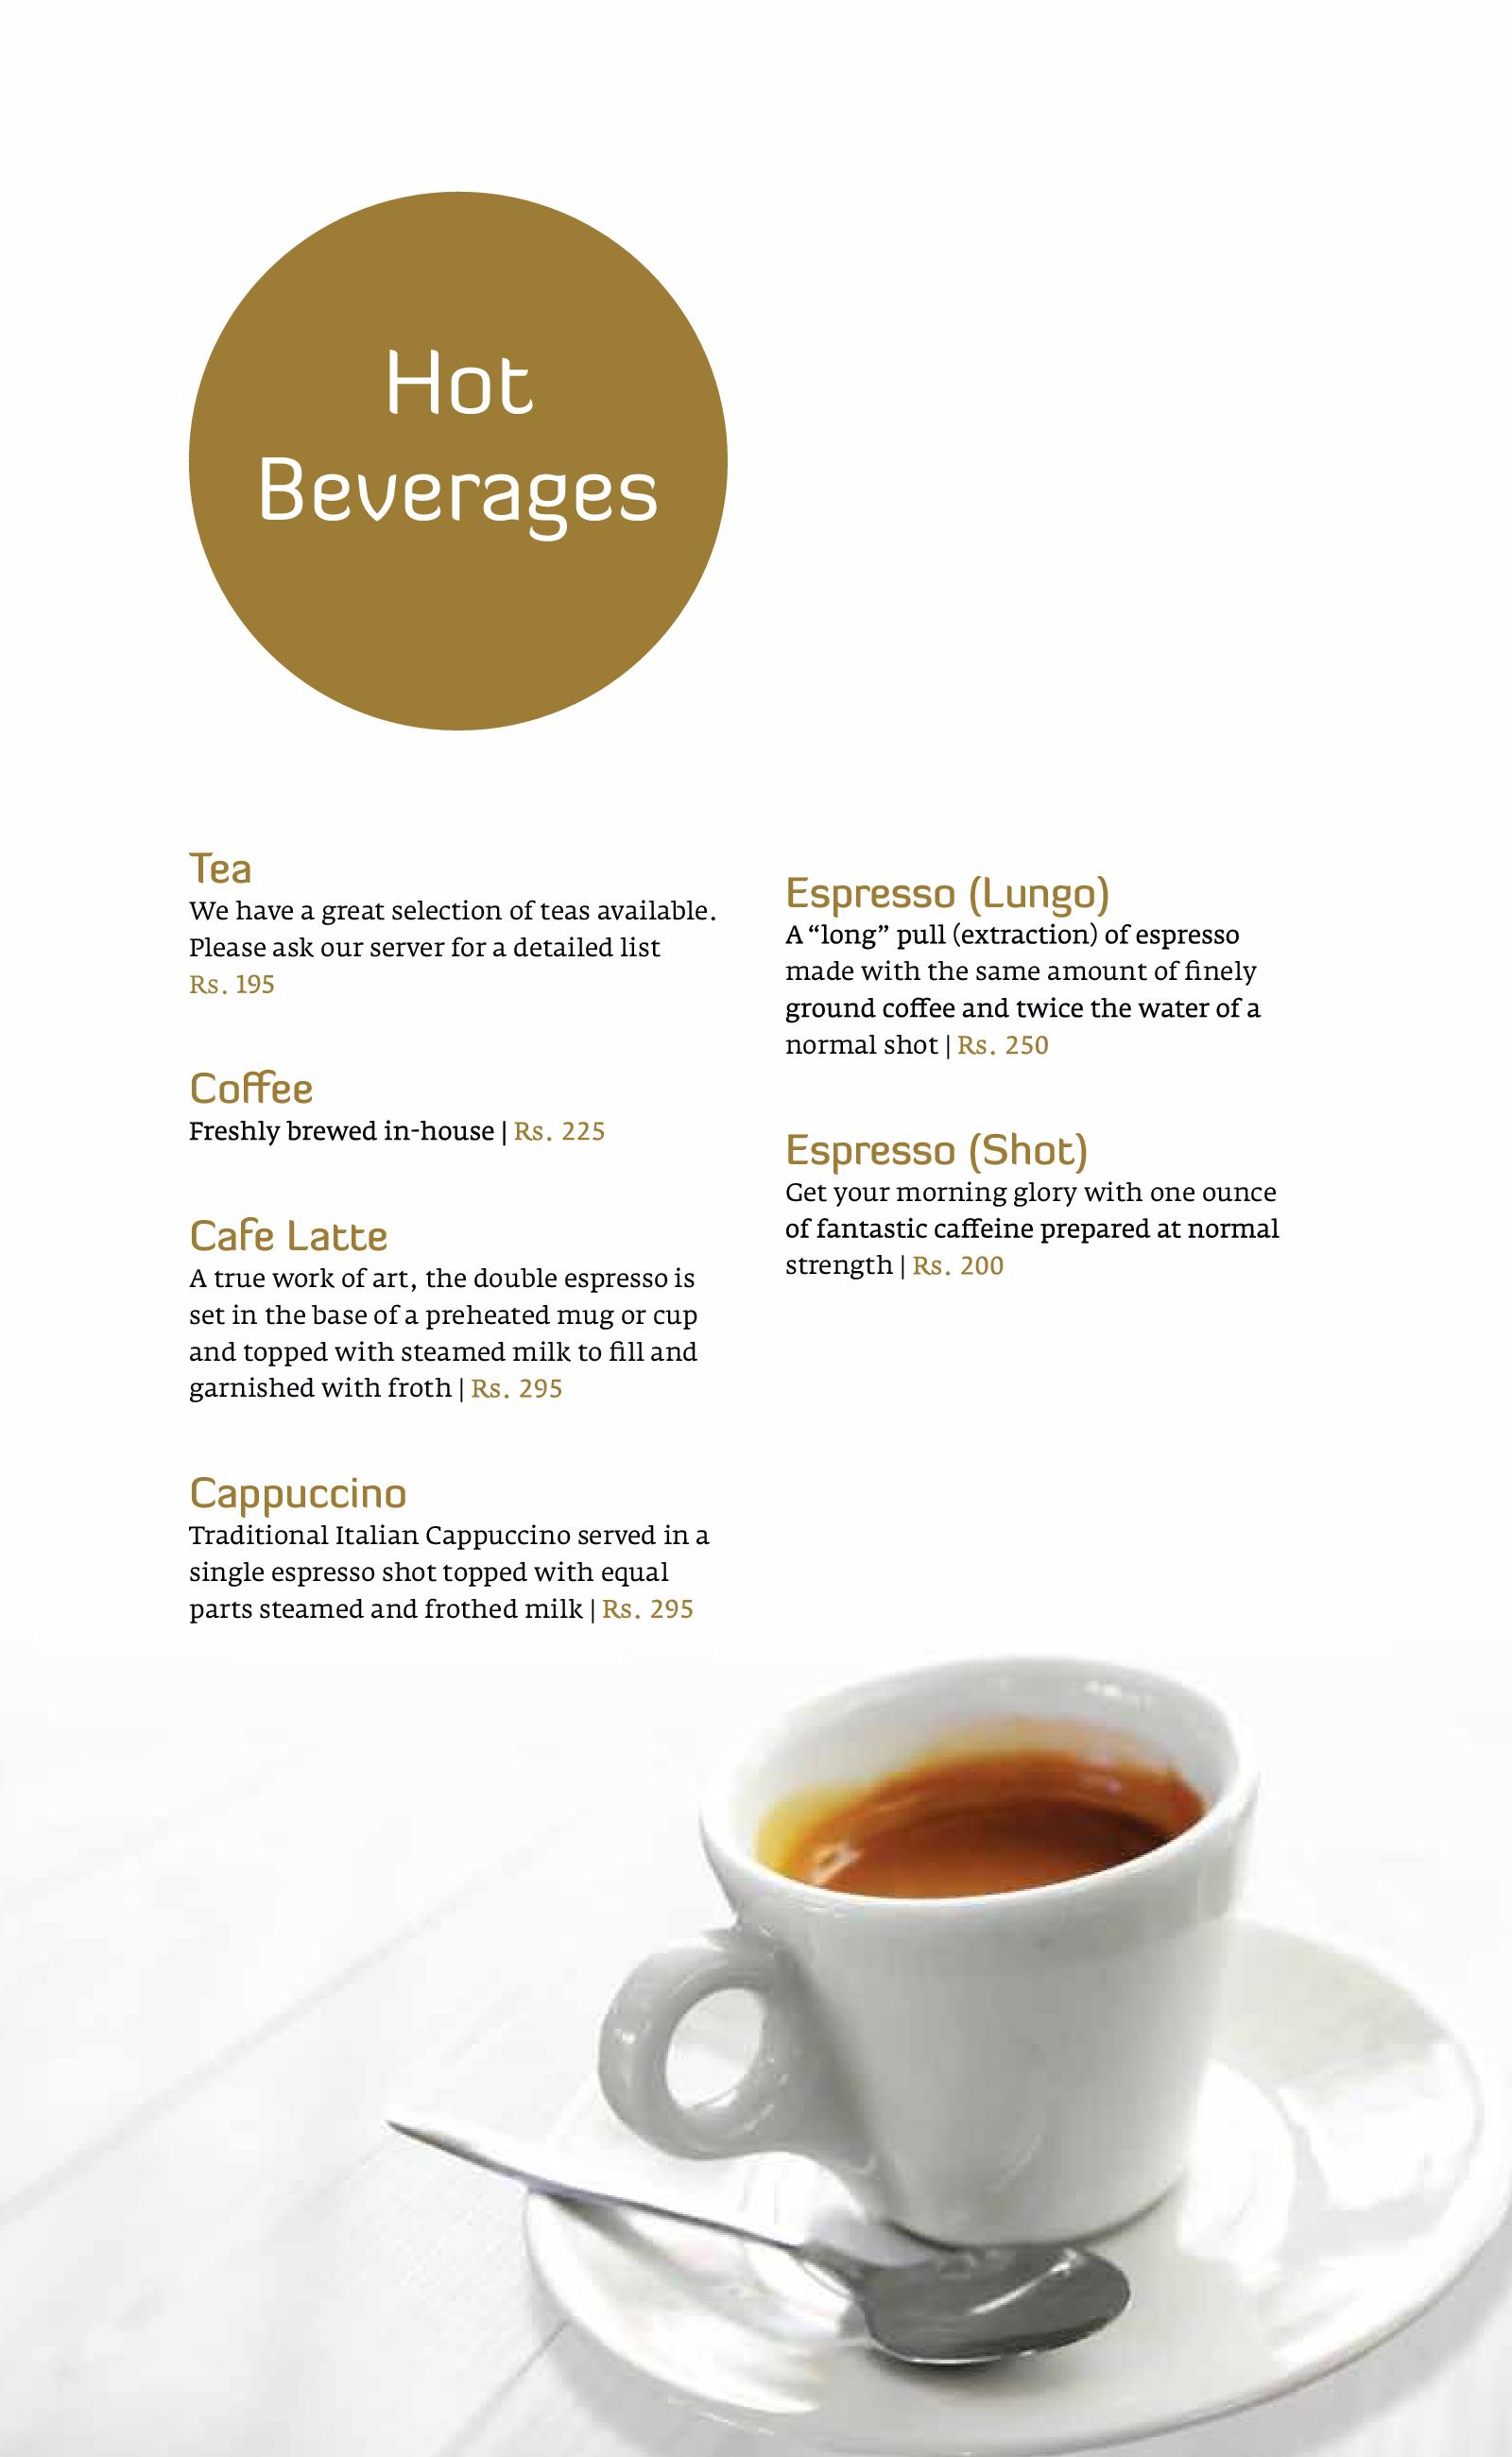 010-insert-menu-beverages-f-cs6_pk_2